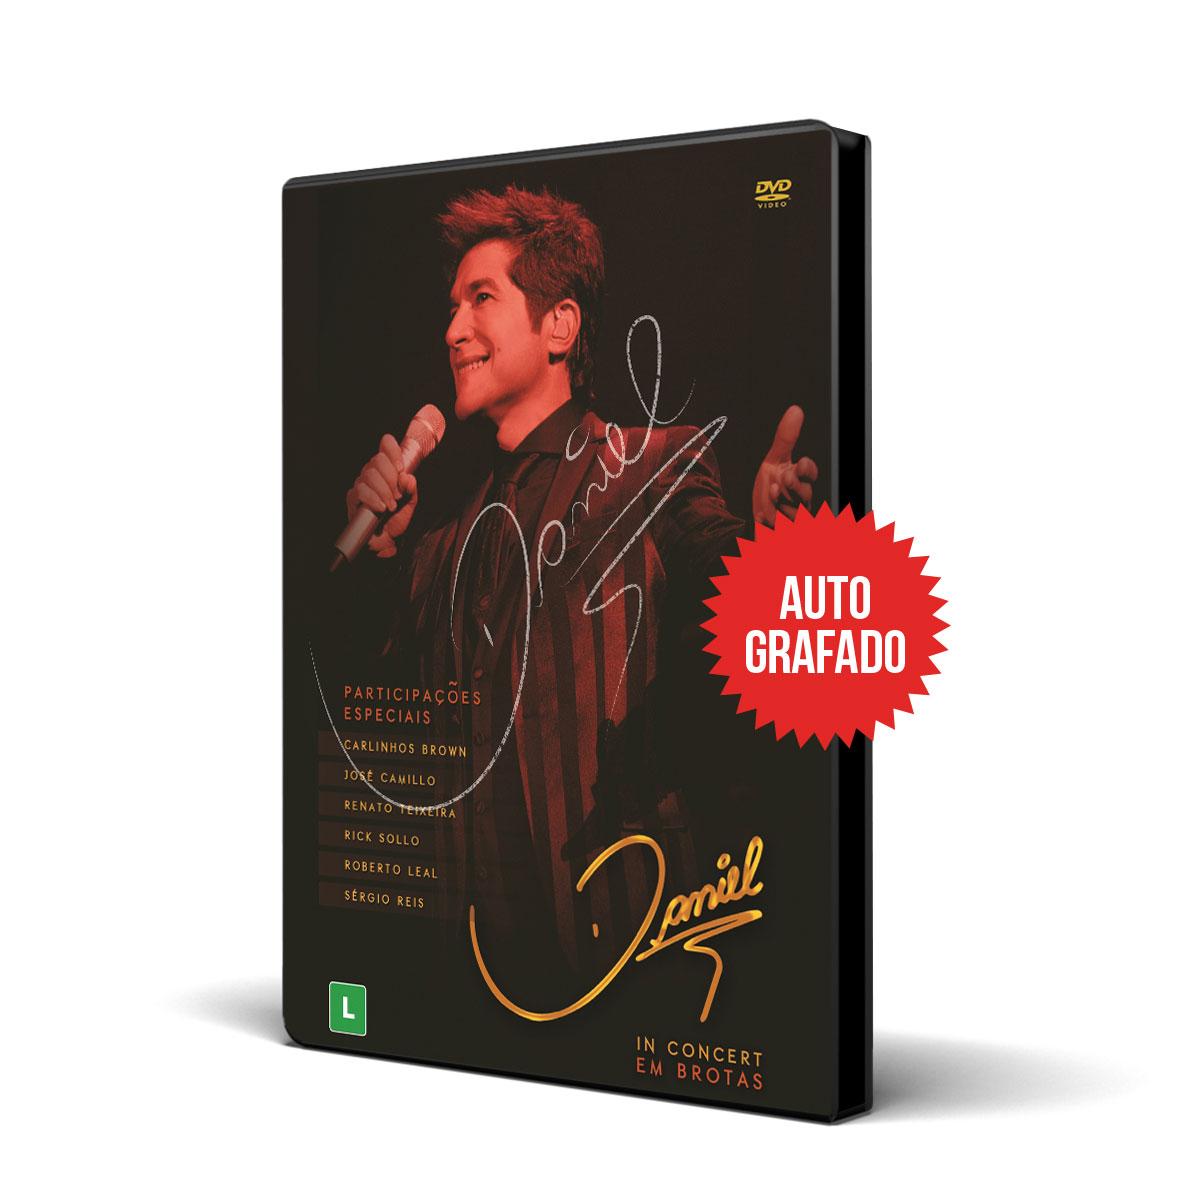 2º Lote Combo DVD Autografado Daniel In Concert em Brotas + Camiseta Feminina